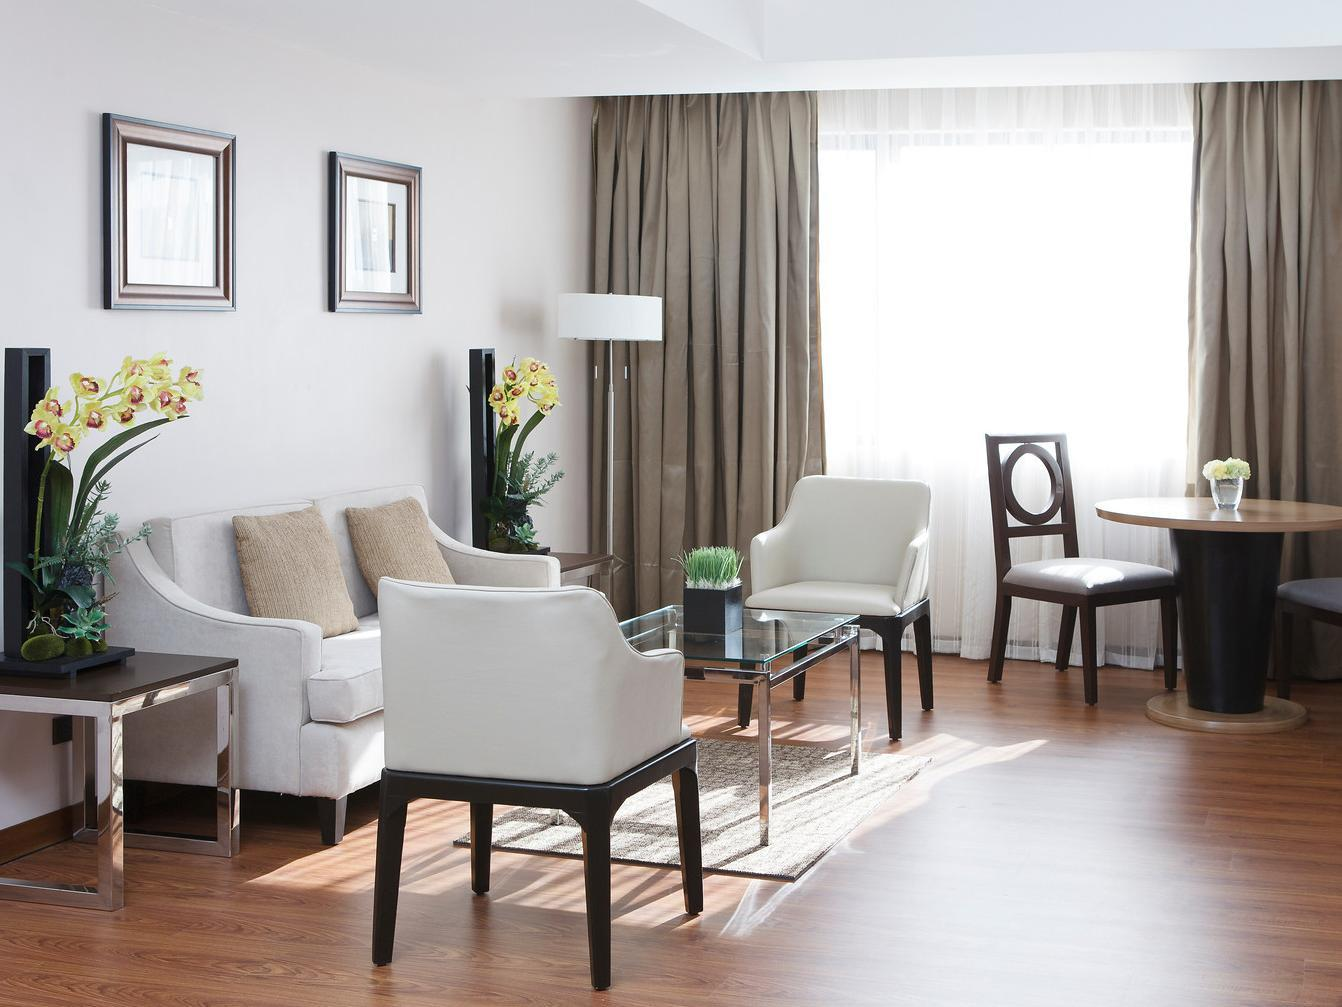 Ace Hotel & Suites - Suite Room